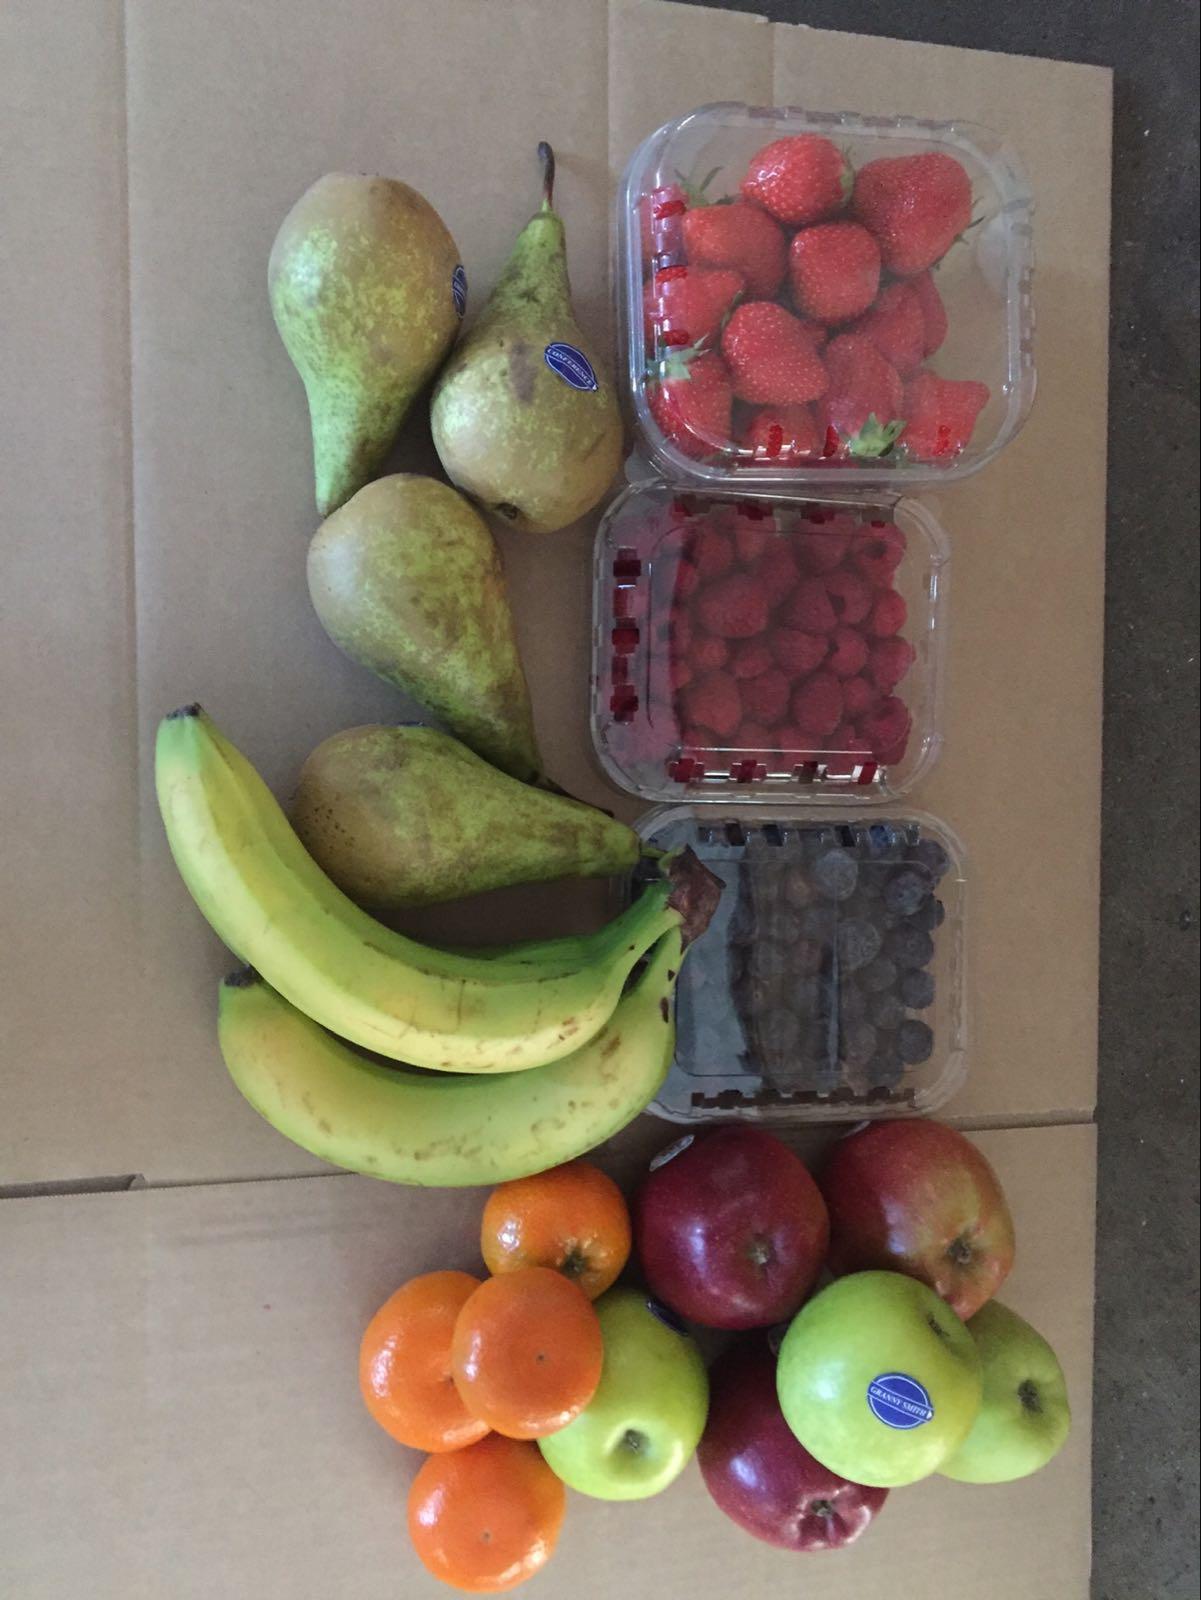 The TWA Fruit Box